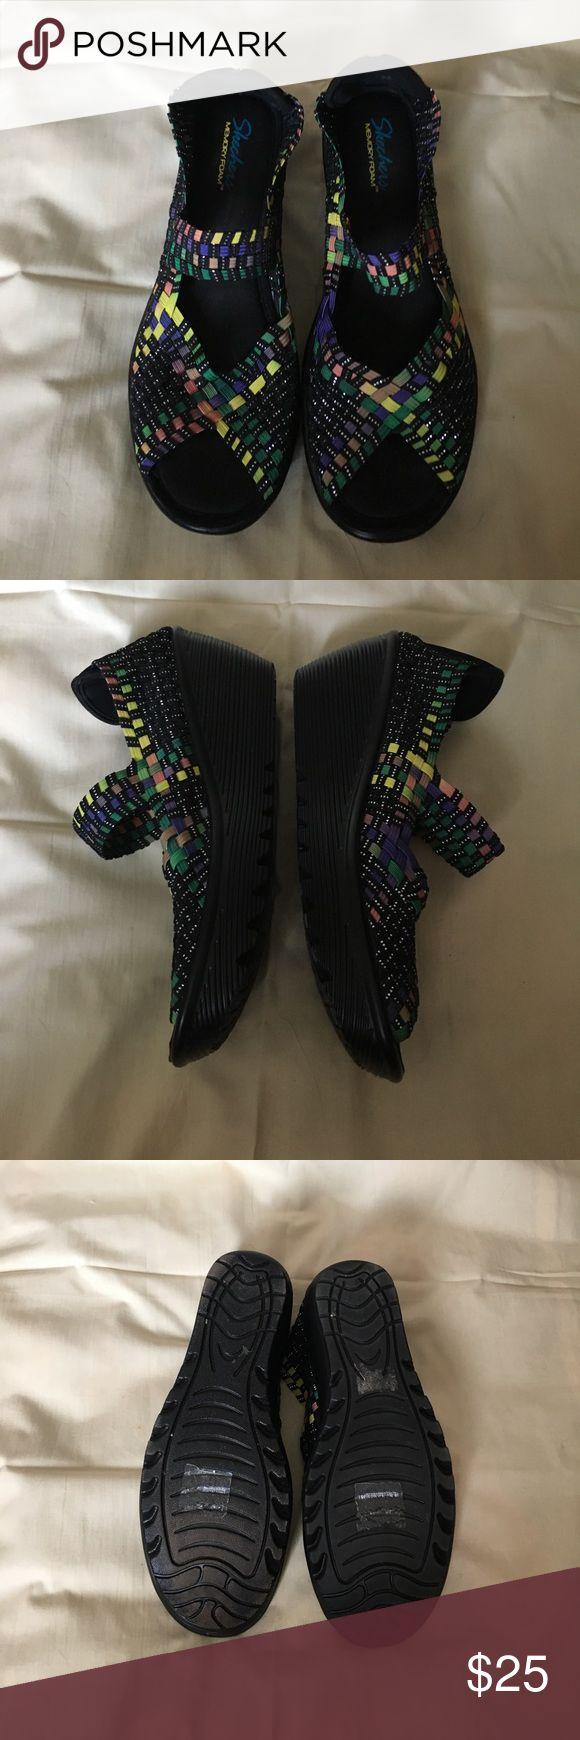 "skechers wedge shoe multi coloured memory foam wedge shoe . open toed. heel 2.5"" platform 0.5"". barely worn Skechers Shoes Wedges"